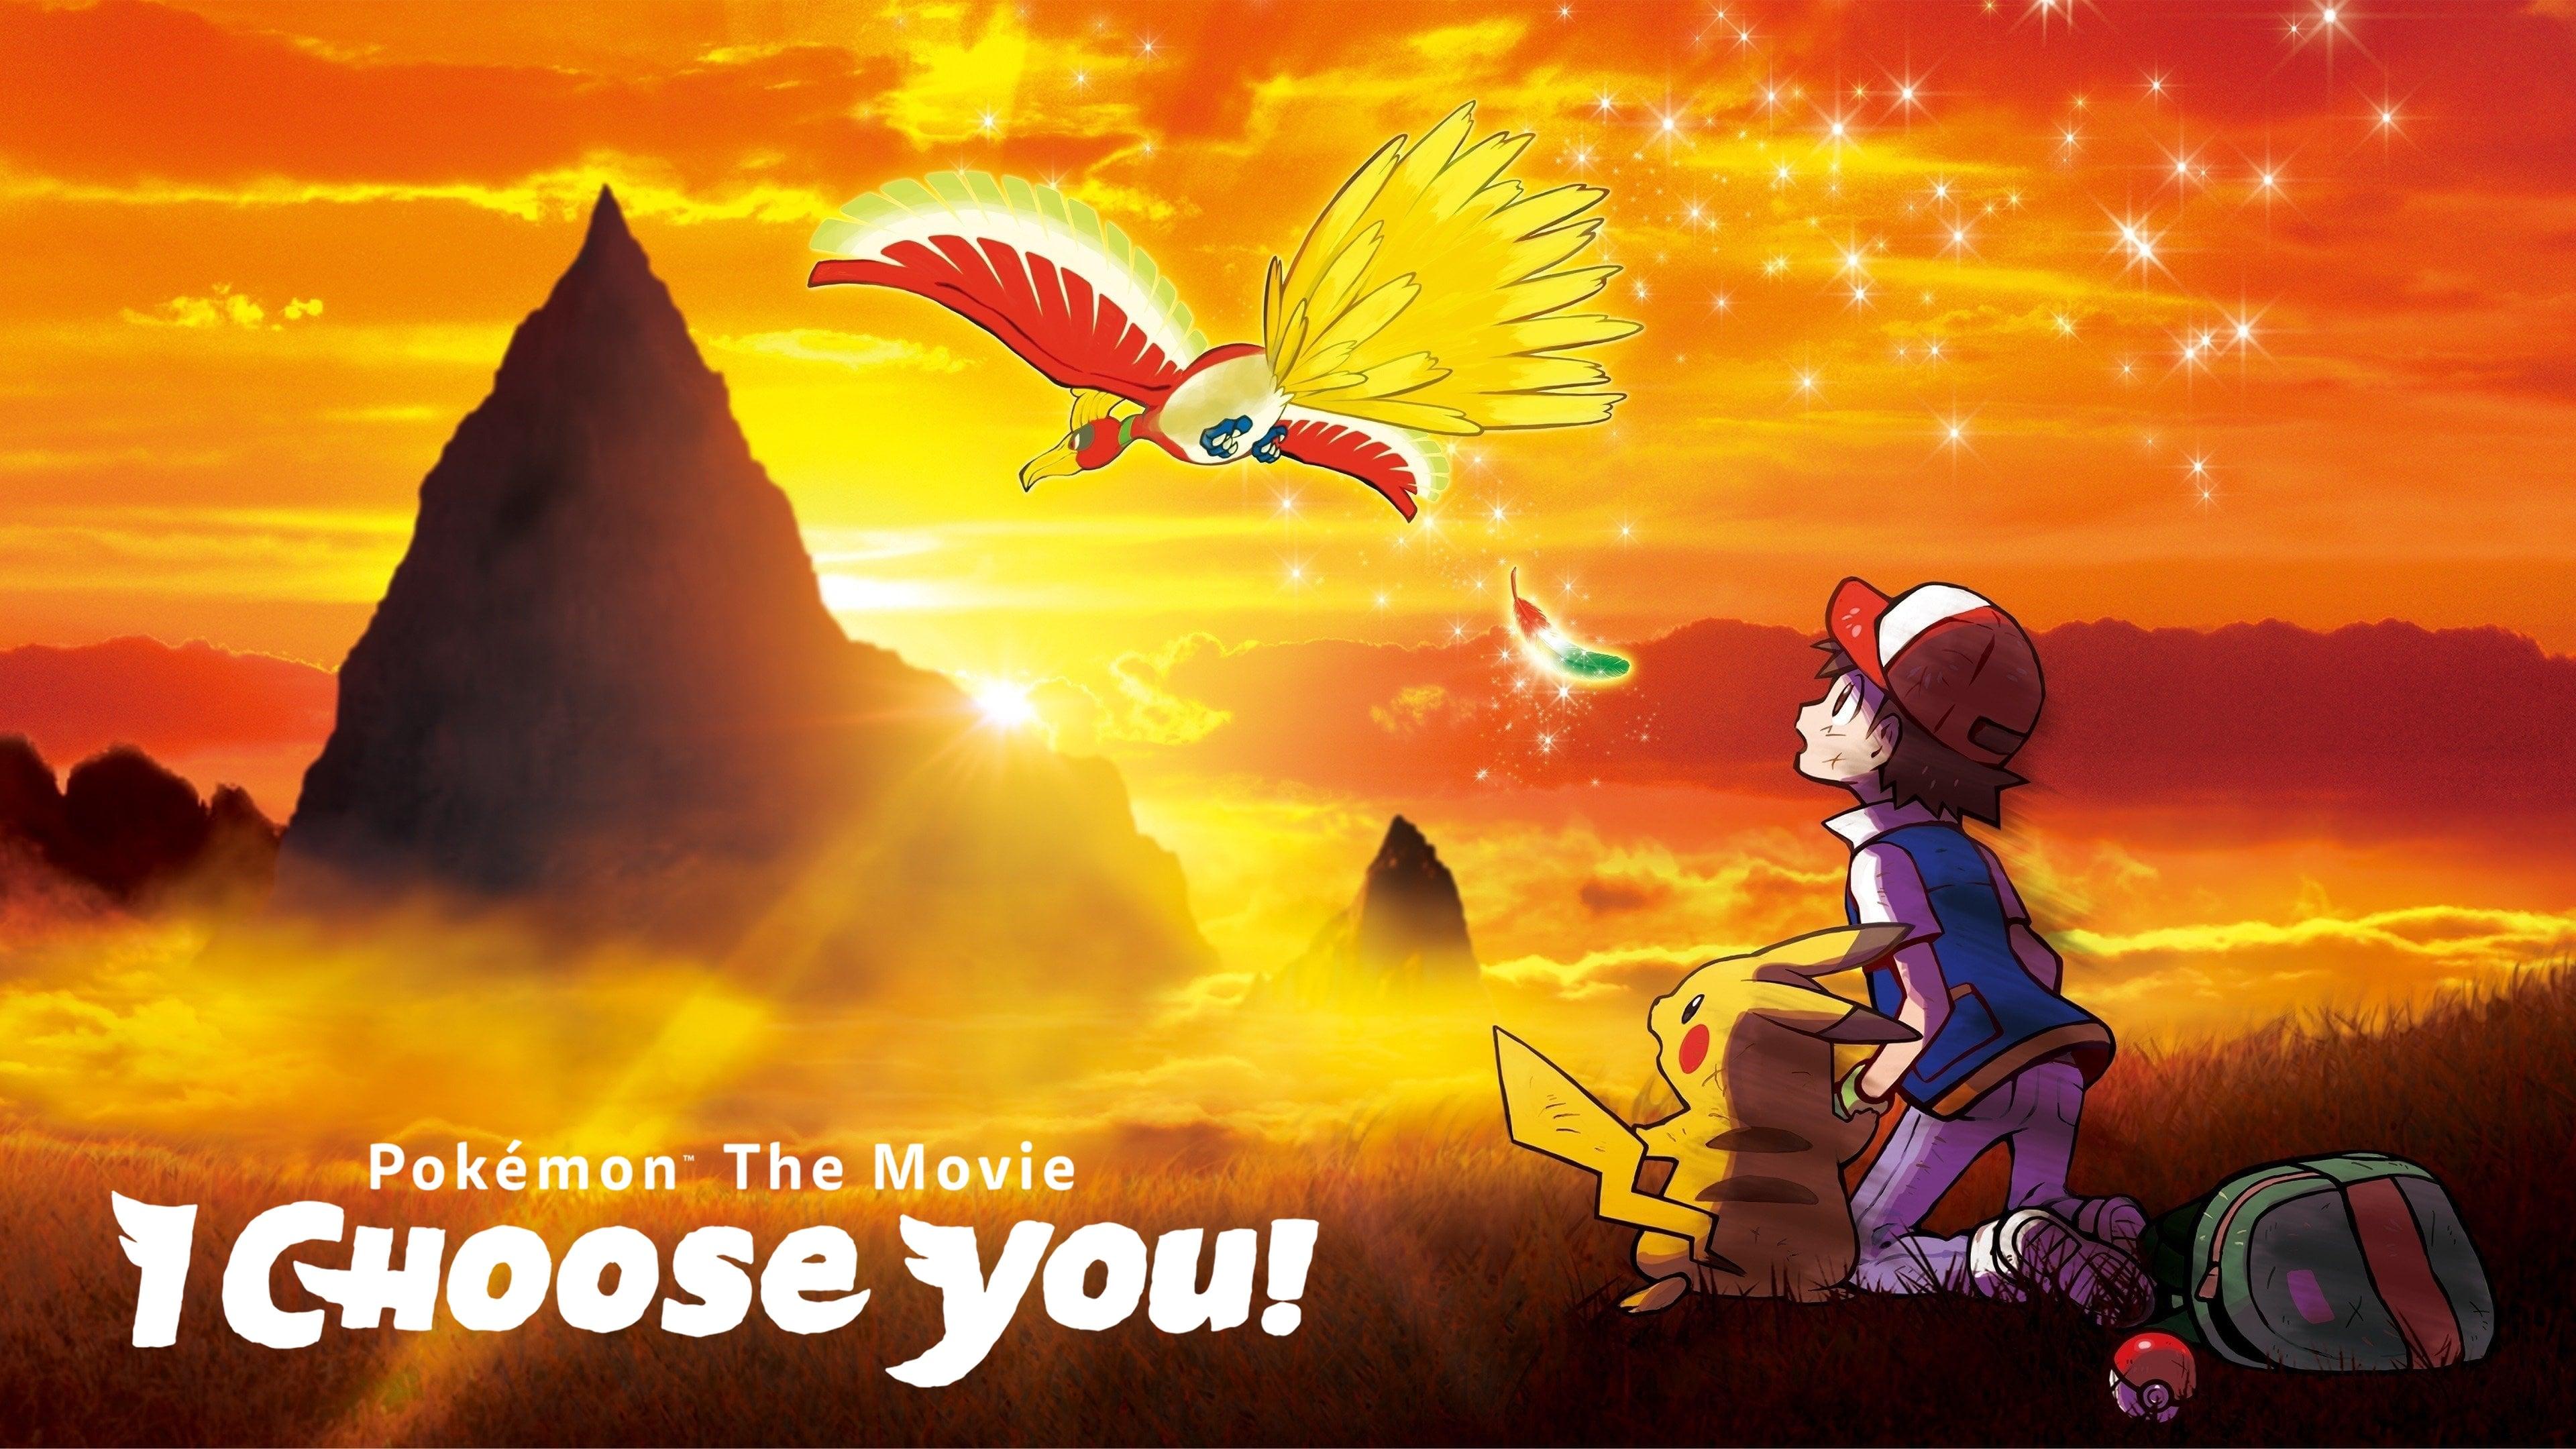 Pokémon the Movie: I Choose You! (2017)